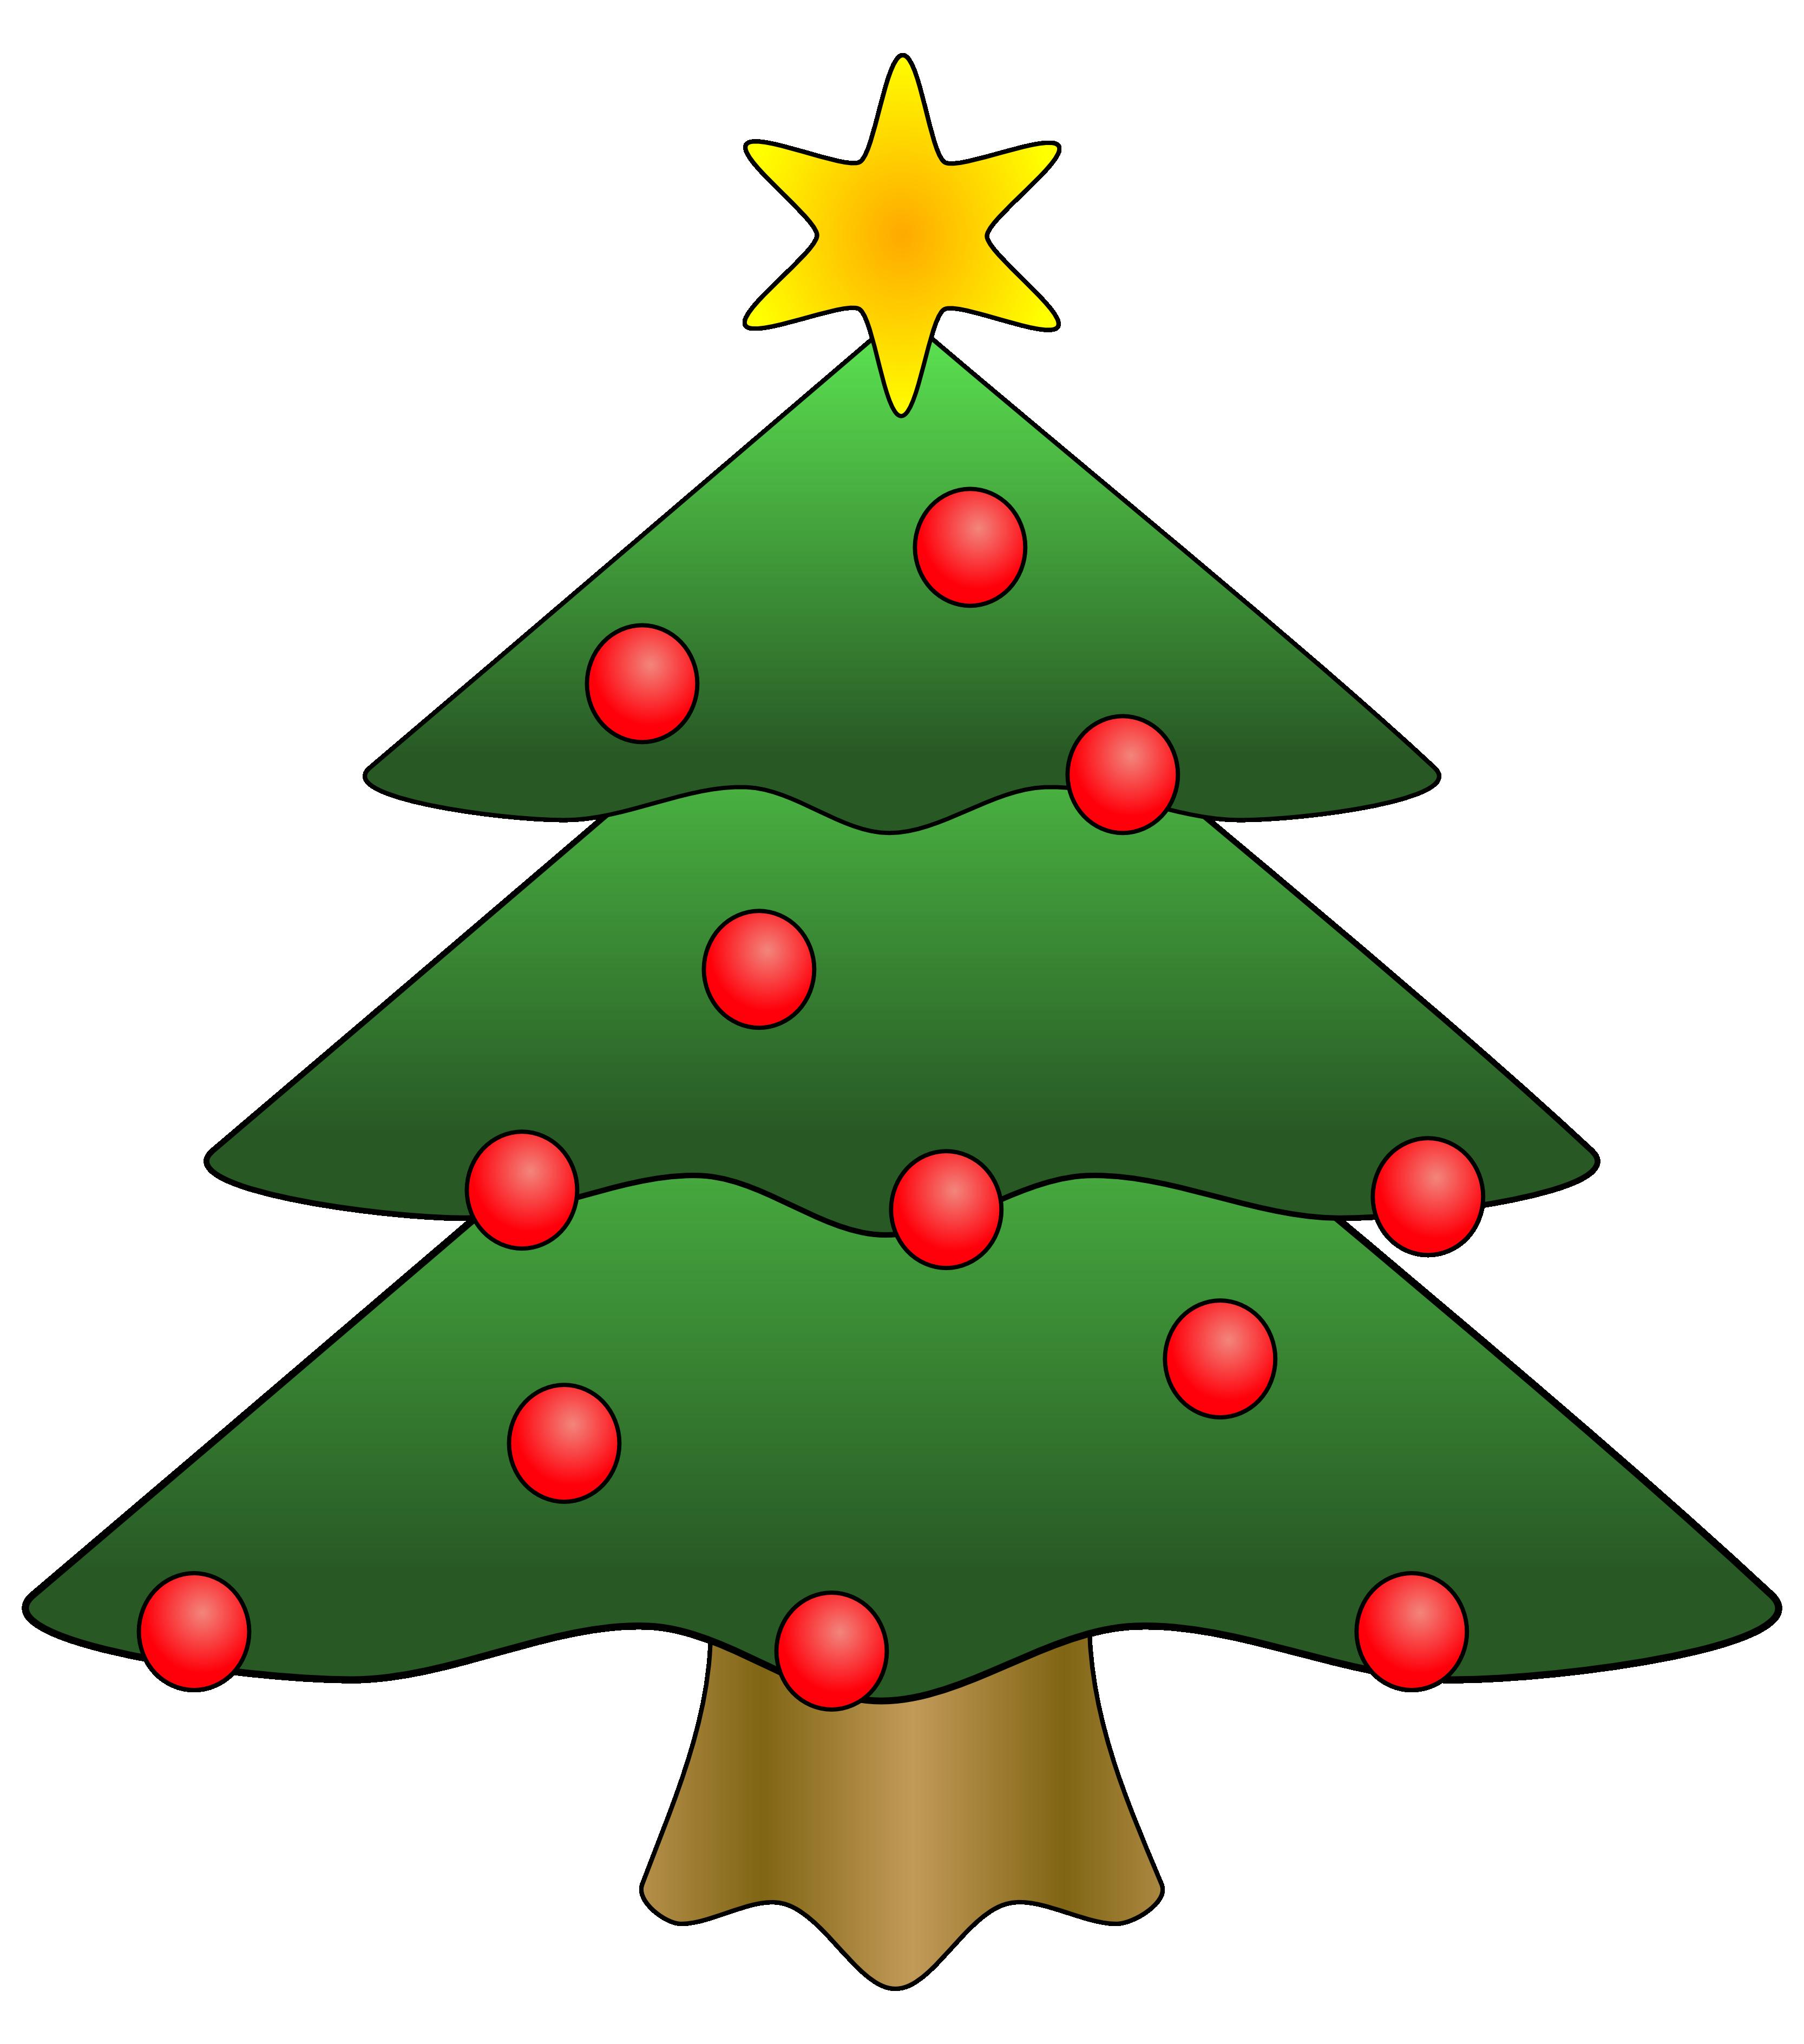 Clip Art Christmas Tree | Clipart Librar-Clip Art Christmas Tree | Clipart library - Free Clipart Images-10